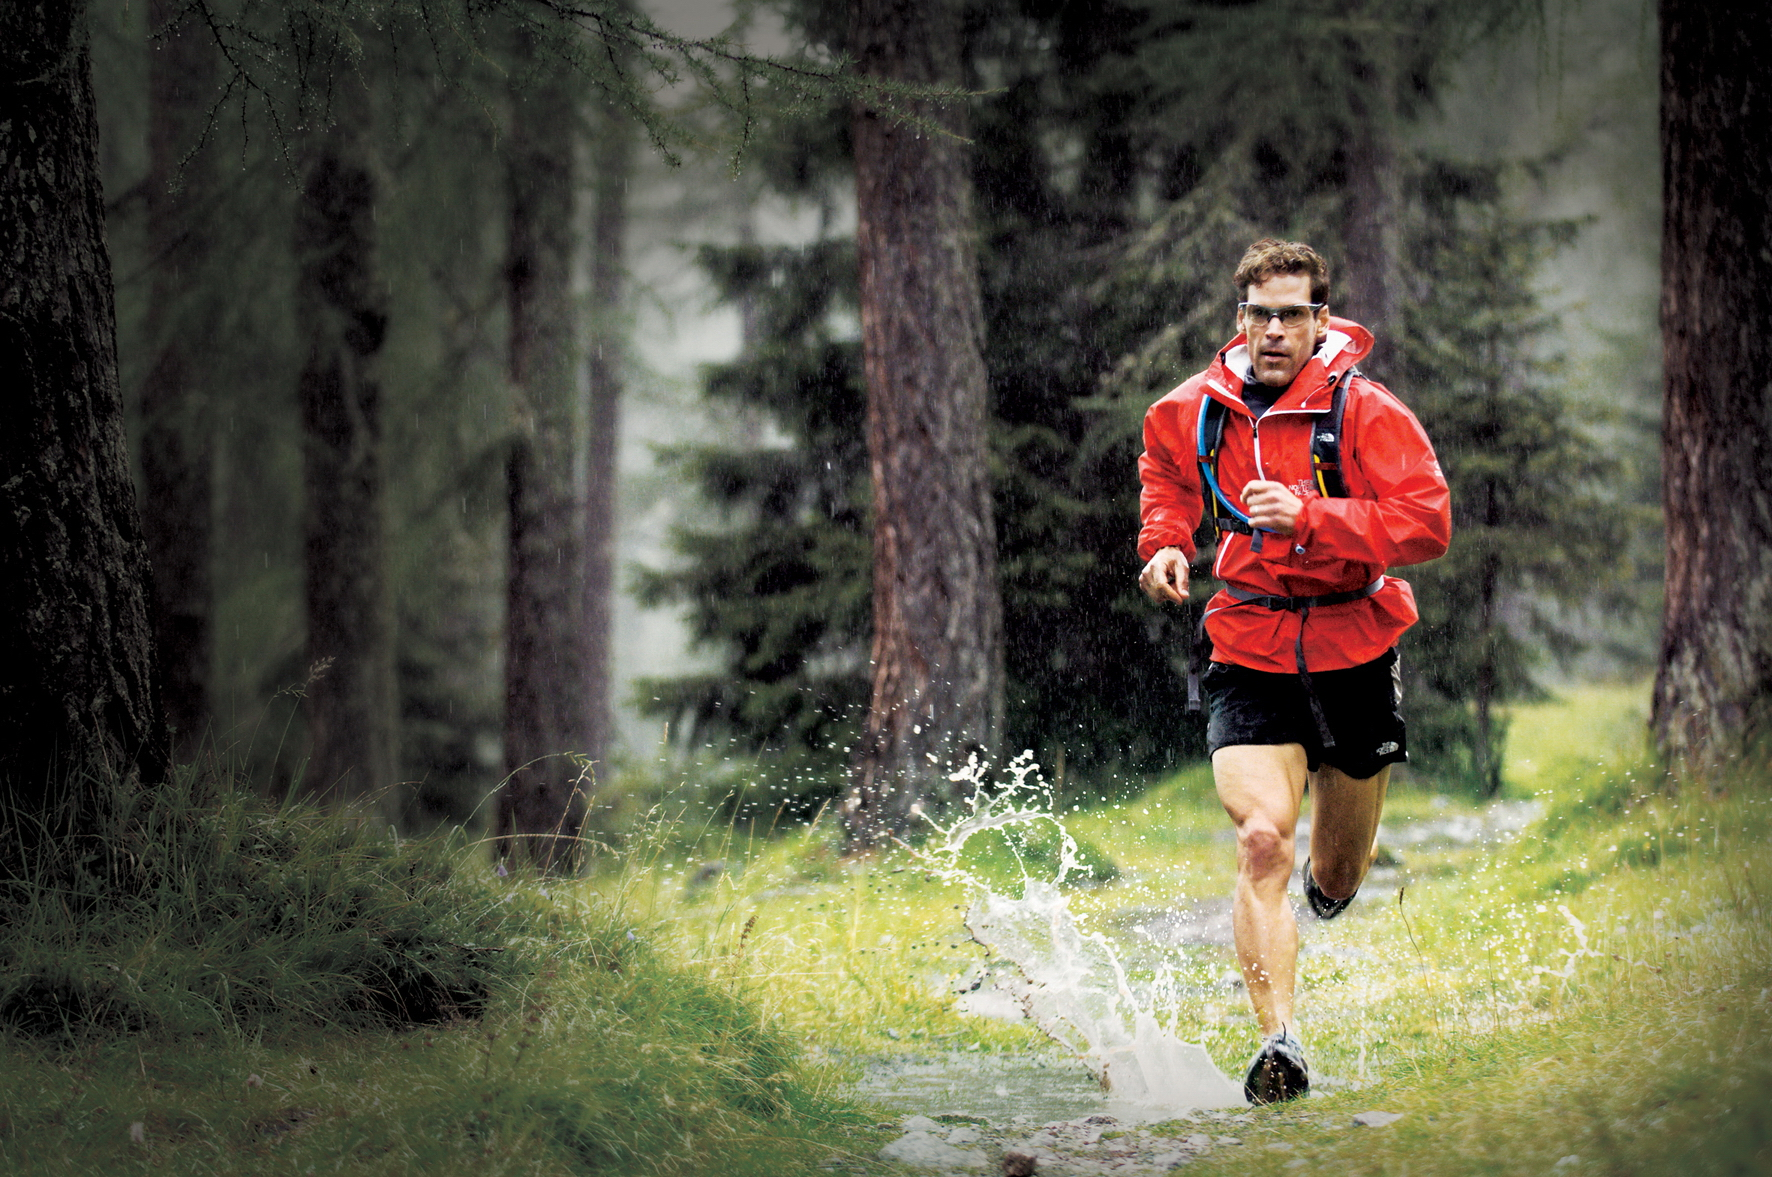 marathon man   Marathon Man   Photo Picture Image and Wallpaper 1772x1177